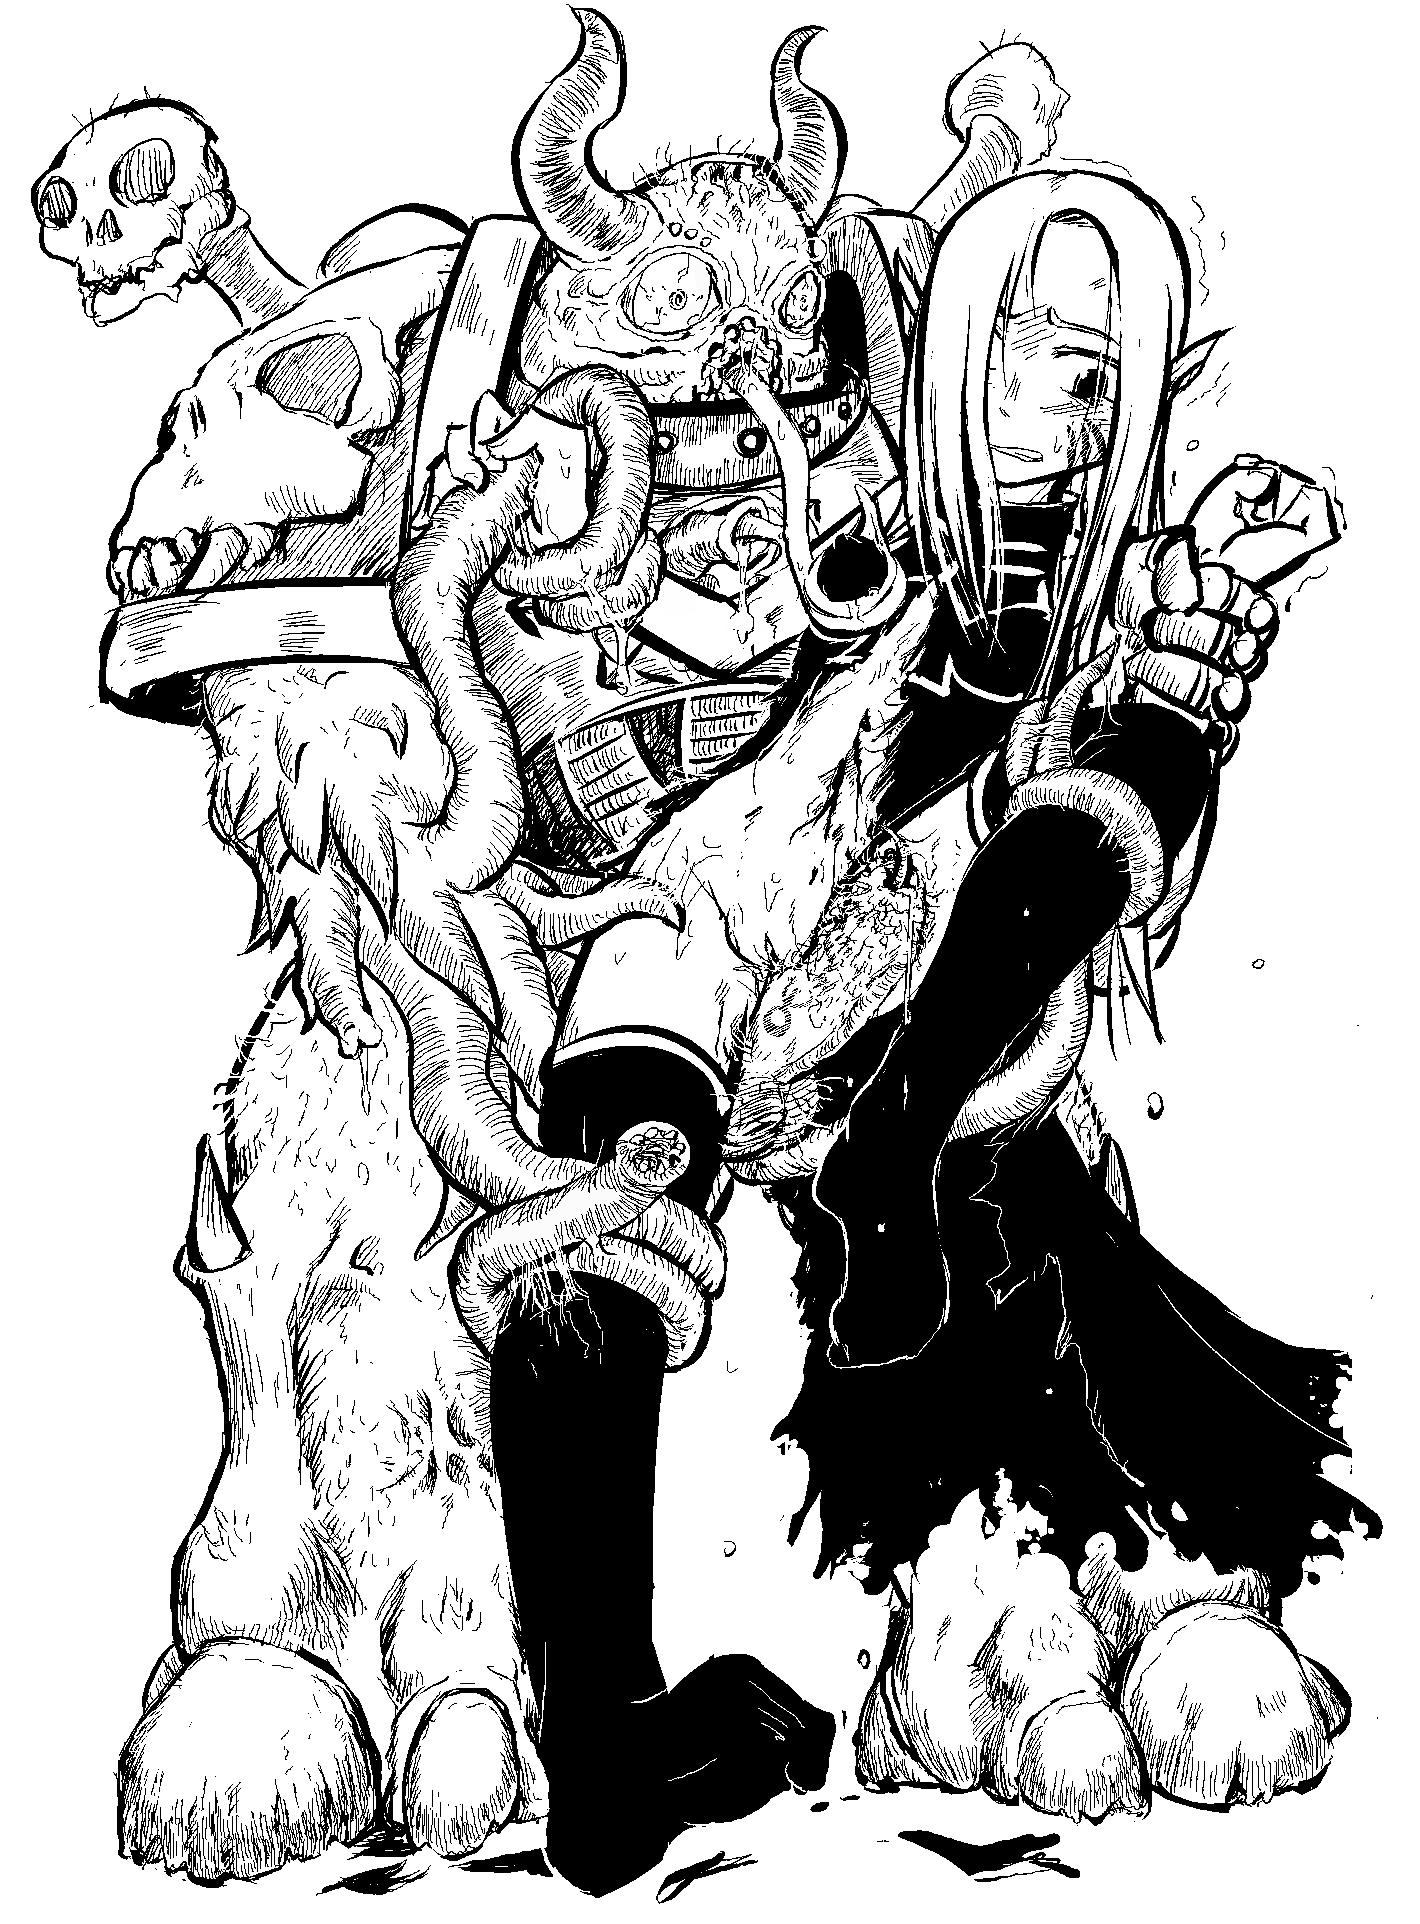 f crawling nyarko-san: chaos another My hero academia midnight